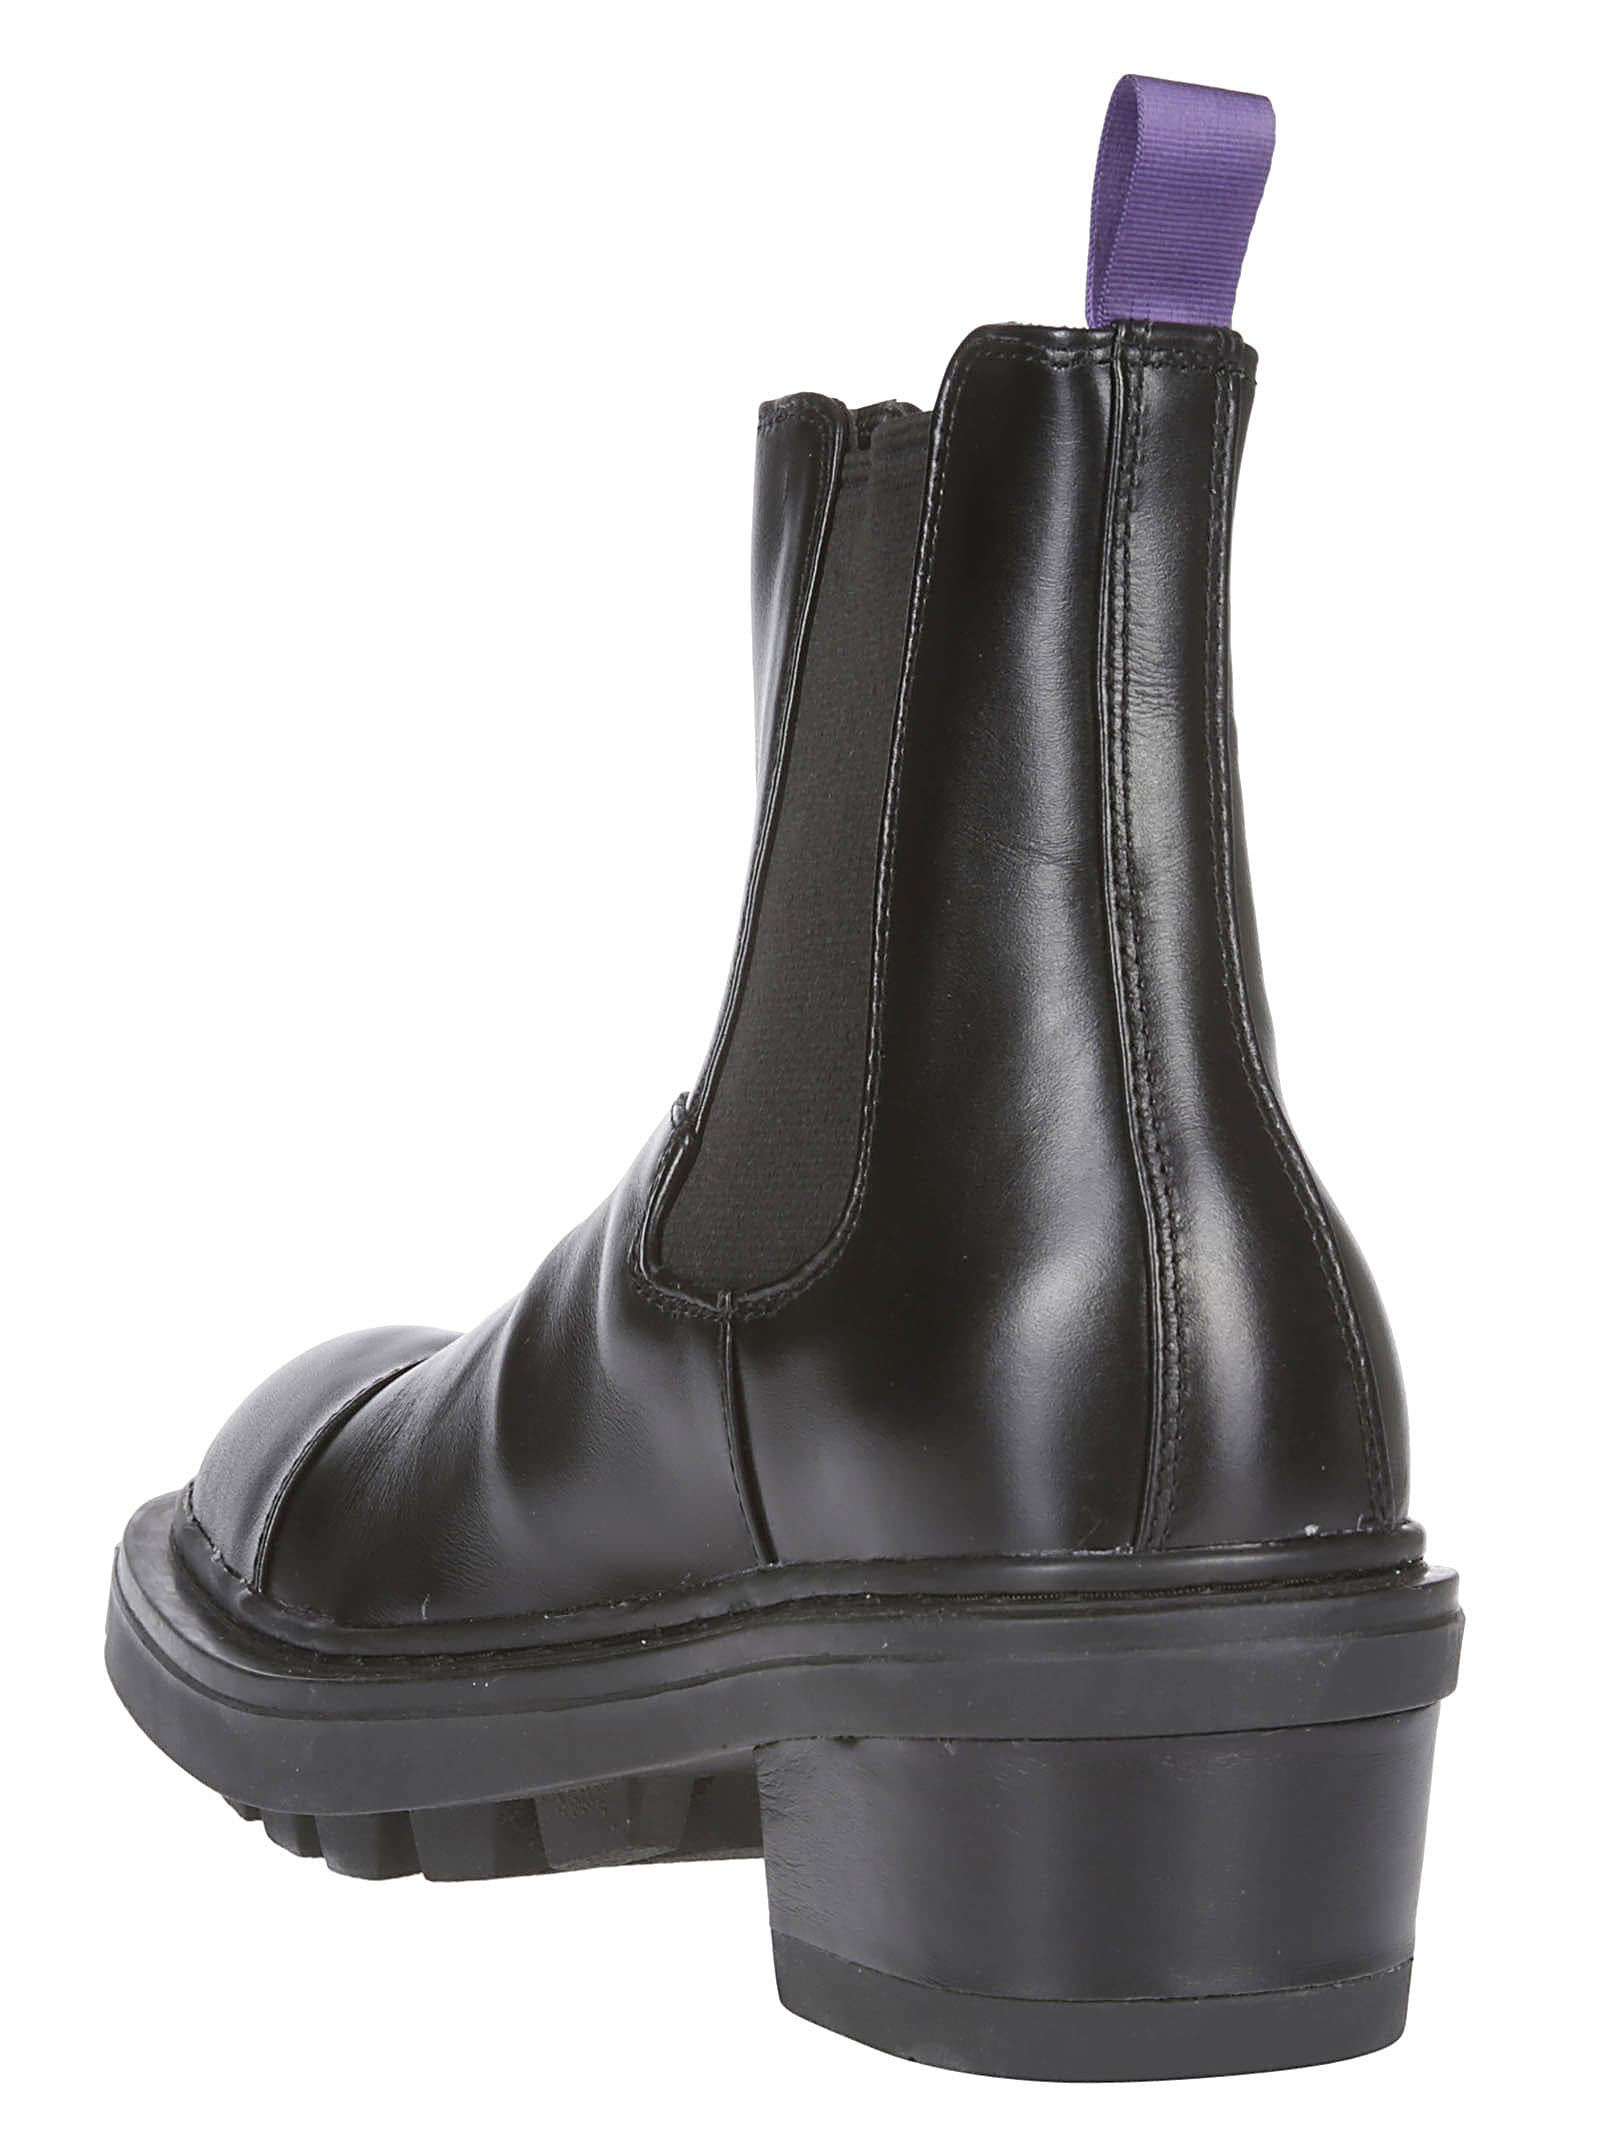 Eytys Shoes | italist, ALWAYS LIKE A SALE